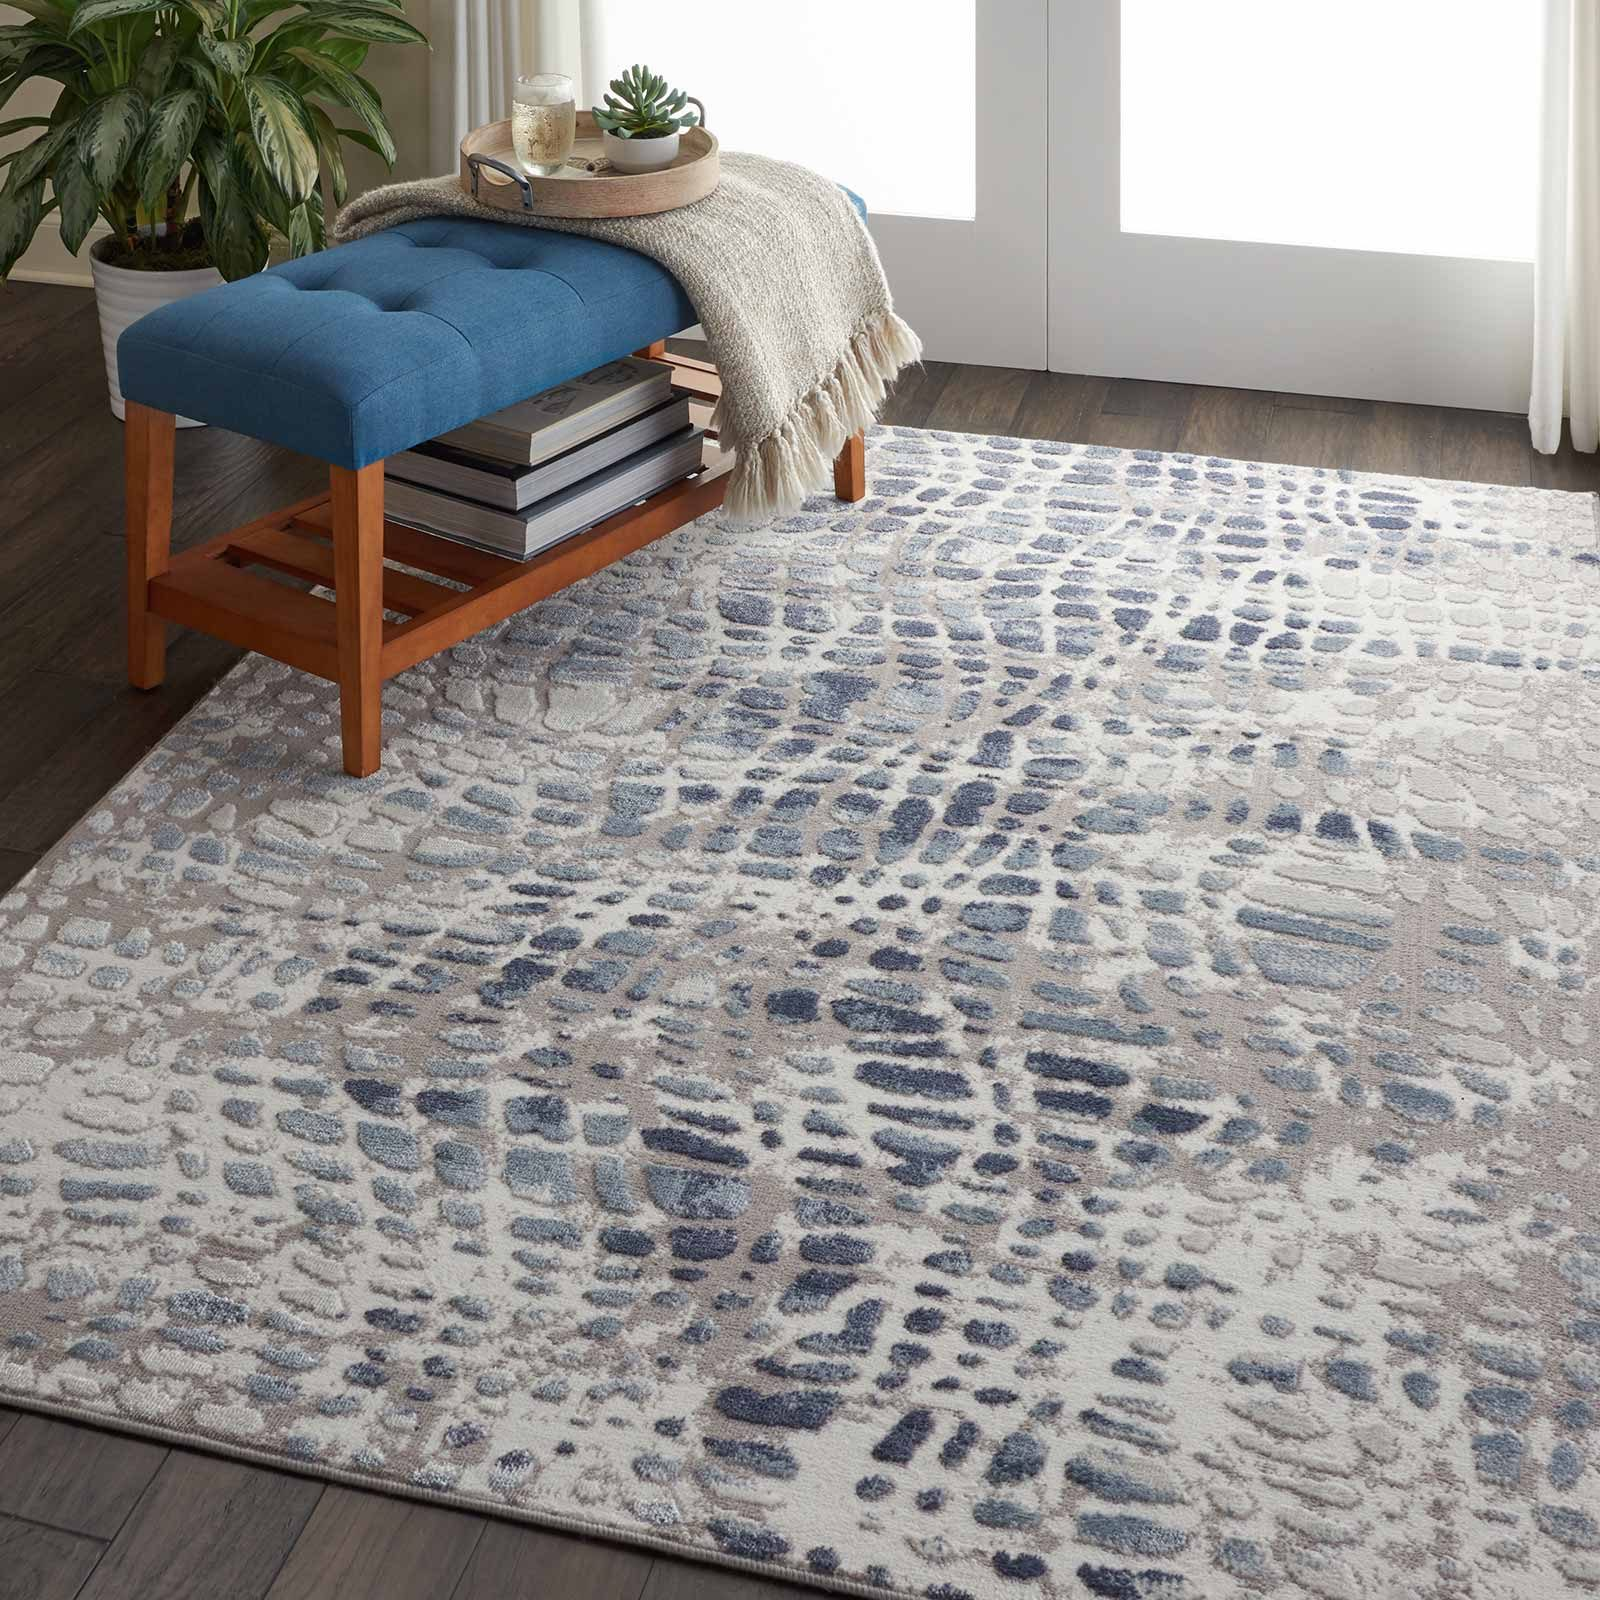 Nourison rug Urban Decor URD04 IVGRY 4x6 099446467102 interior 3 C